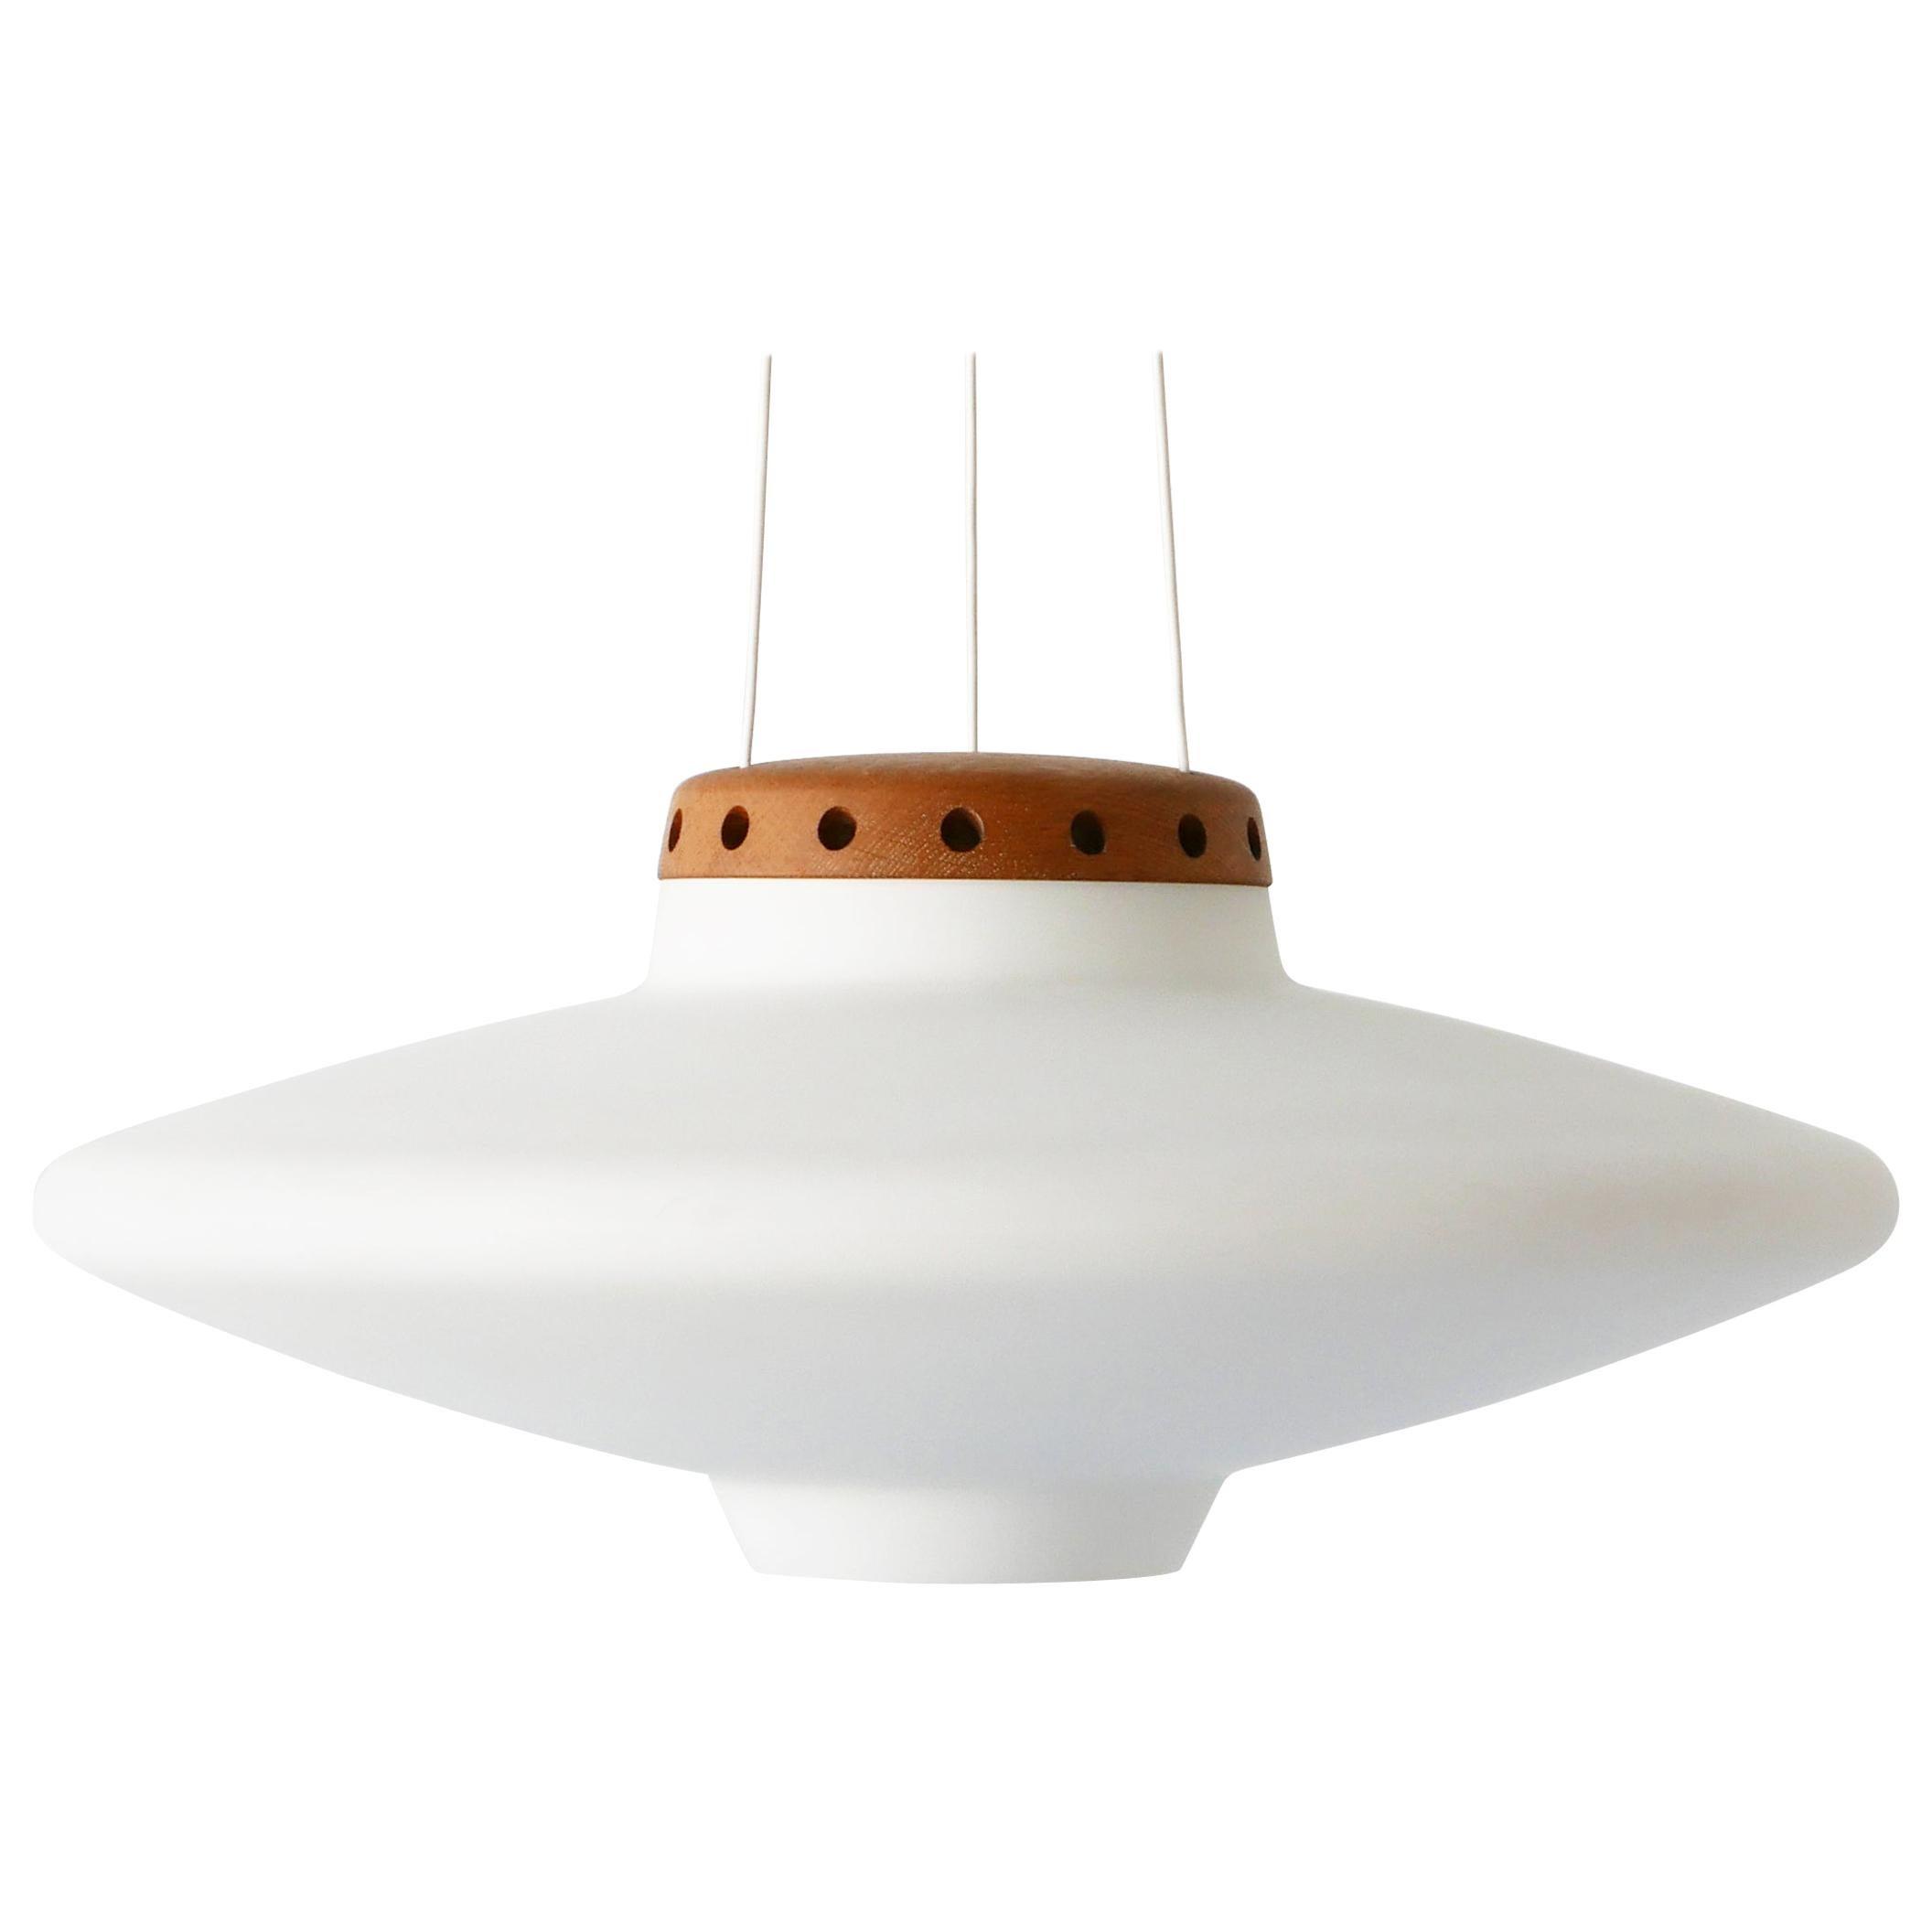 Pendant Lamp Ufo by Uno & Östen Kristiansson, 1950s for Luxus Vittsjö, Sweden